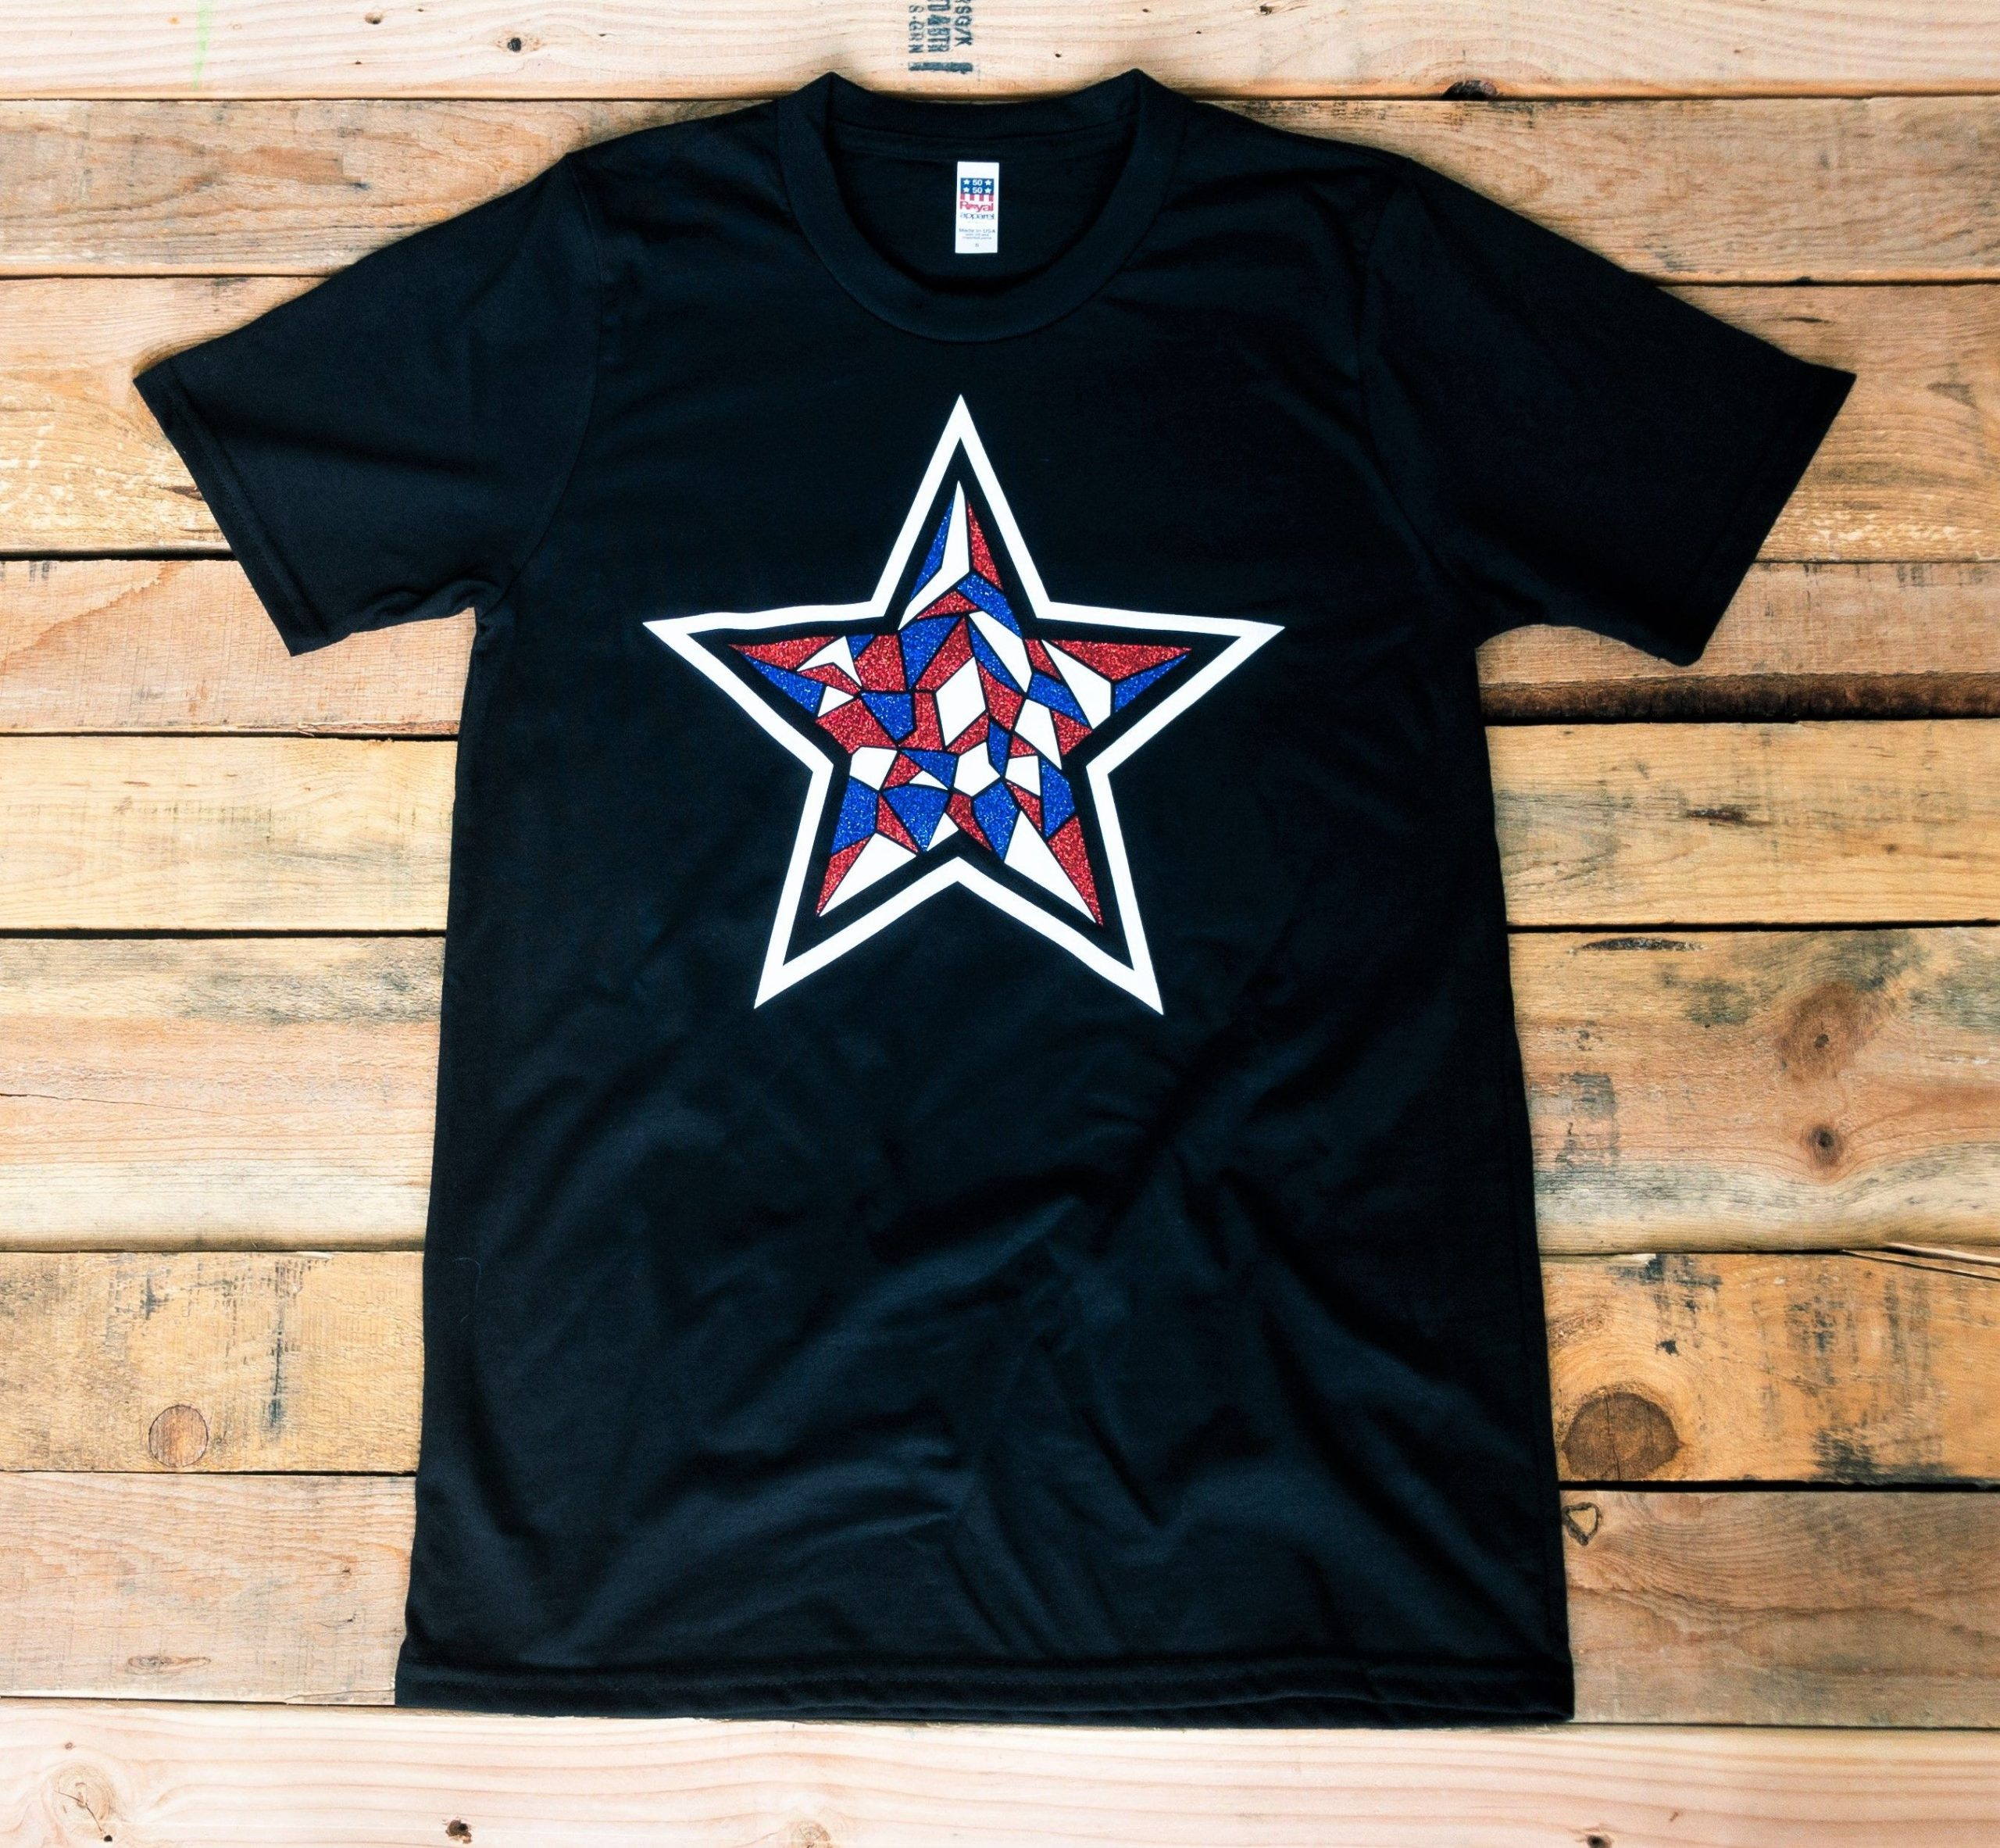 Mosaic Glitter Star Tee, Mosaic Star T-Shirt, 4th of July Women's T-Shirt